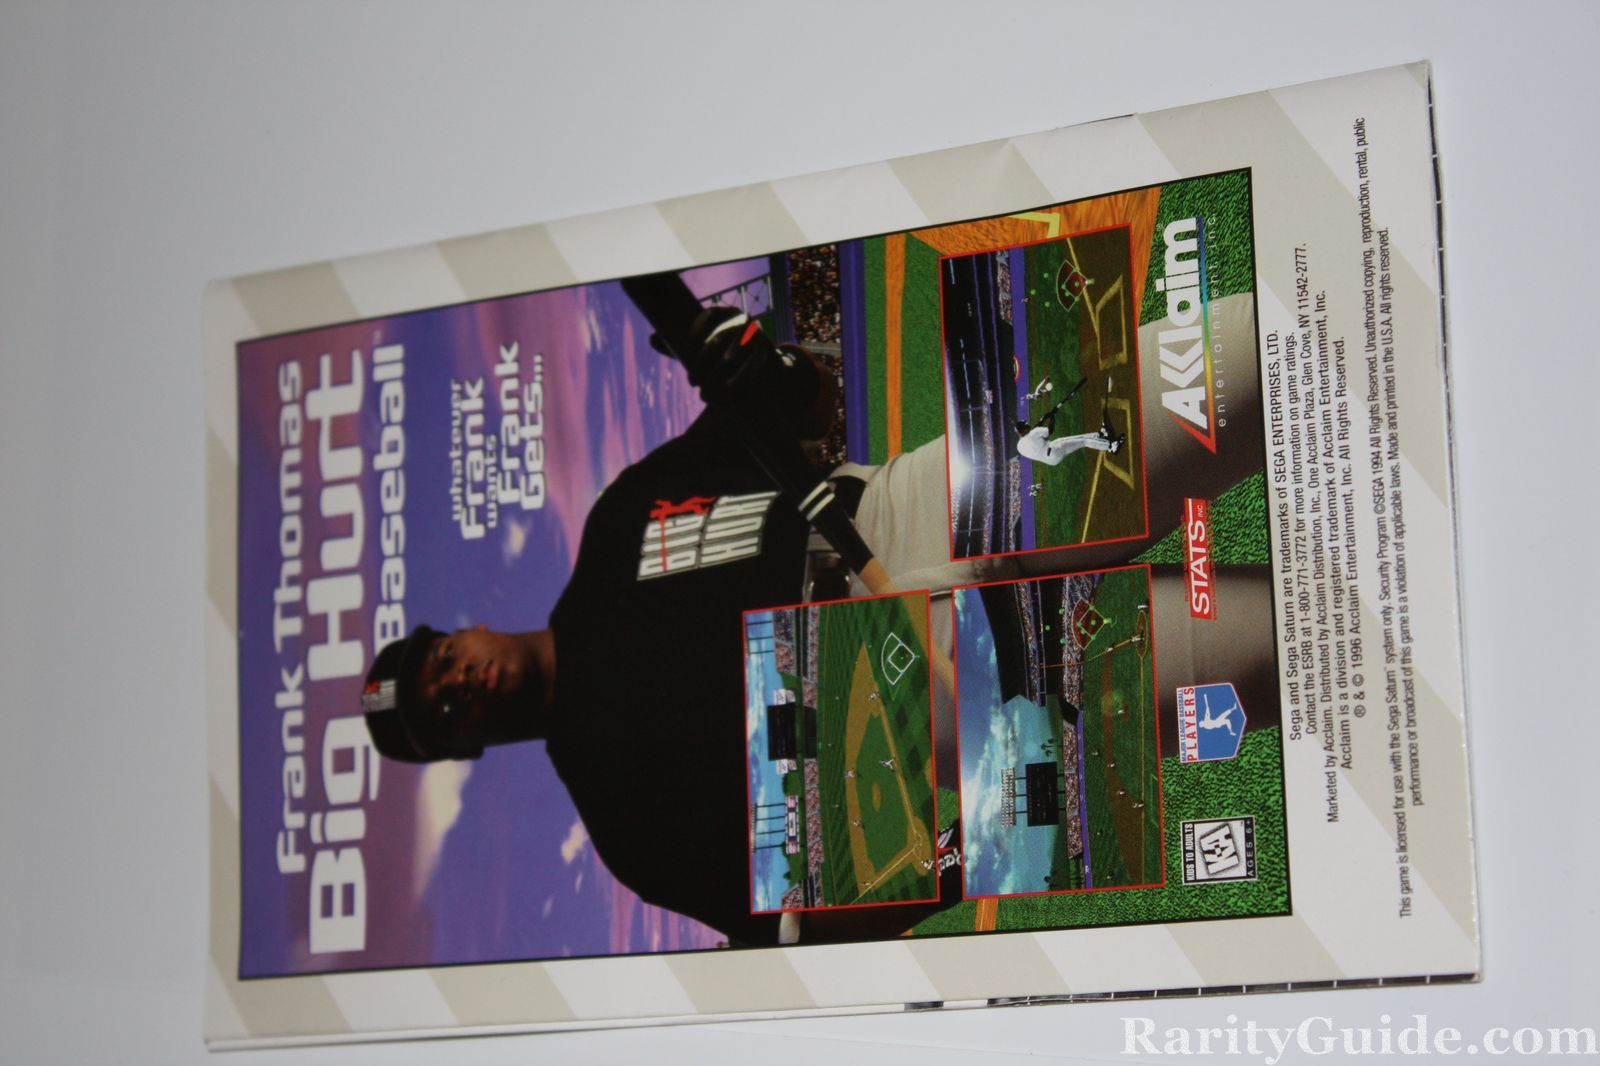 Museum video game consoles sega saturn 1995 sega saturn video game - Sega saturn virtual console ...